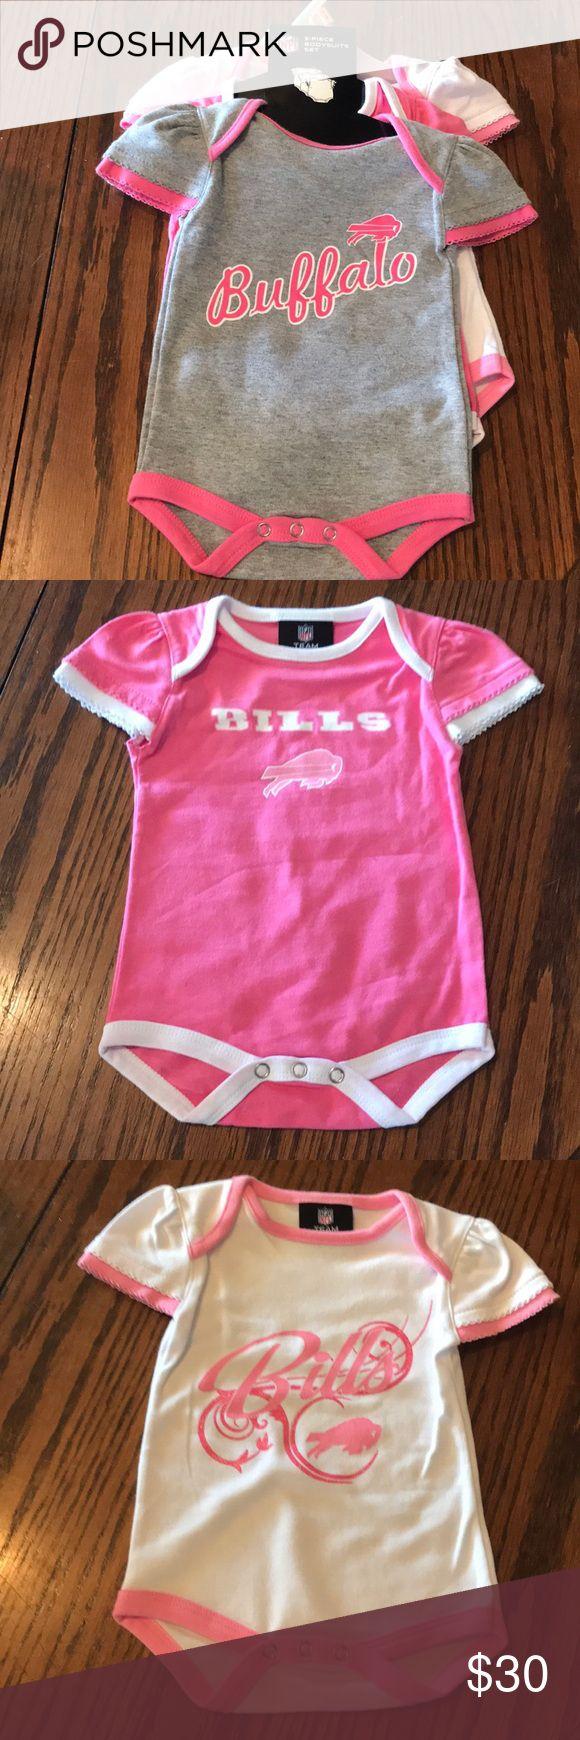 NFL Buffalo Bills Set 3 Infant Outfits New Set of 3 Infant Outfits  Pink, Gray & White  NFL Buffalo Bills 0-3 Months Make me an offer NFL Buffalo Bills One Pieces Bodysuits